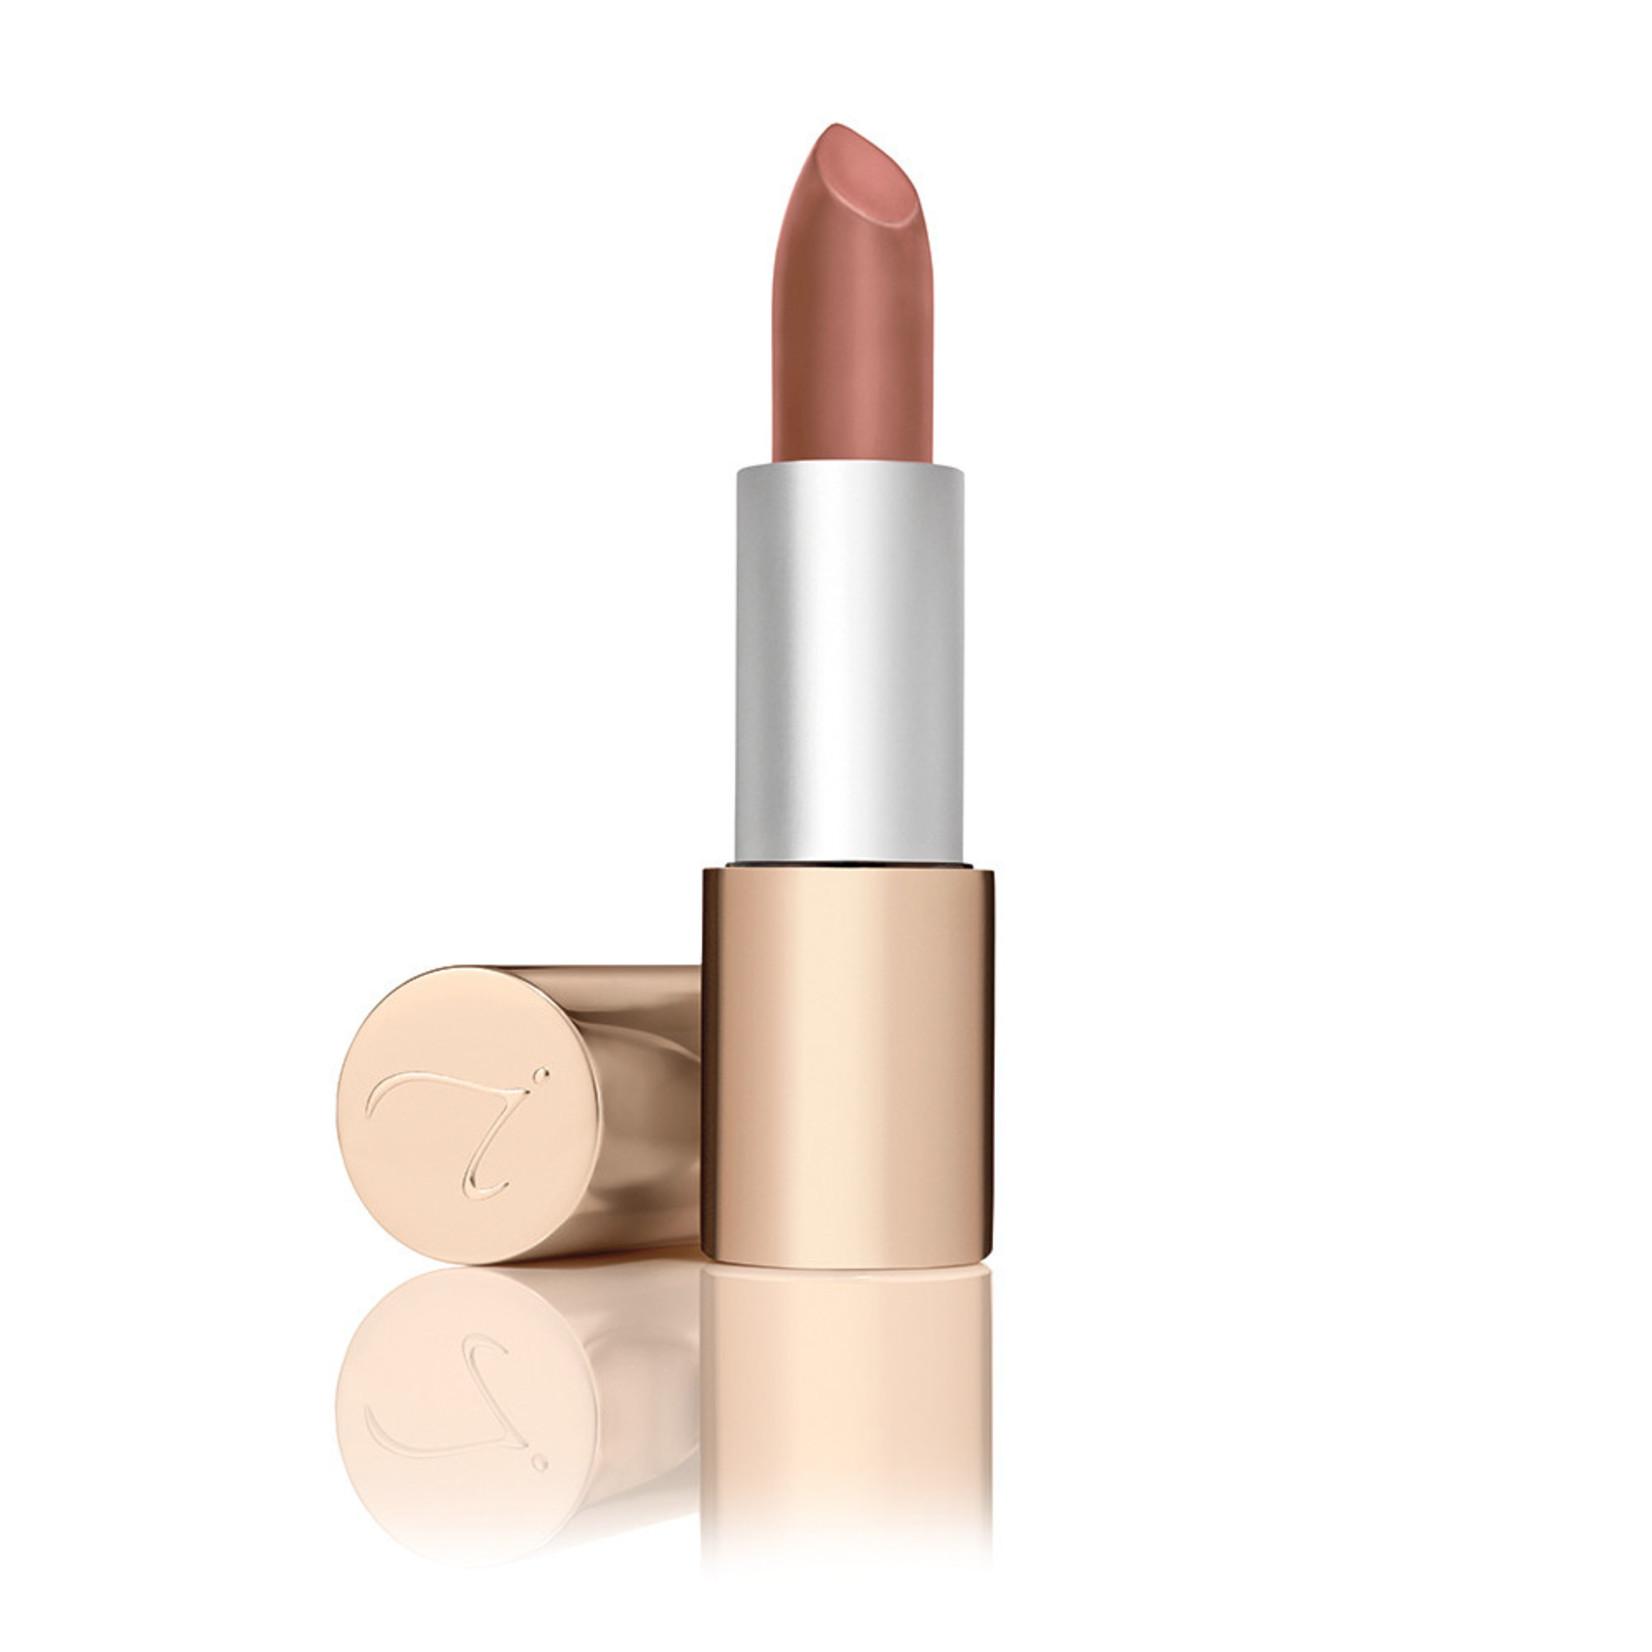 Triple luxe lipstick molly